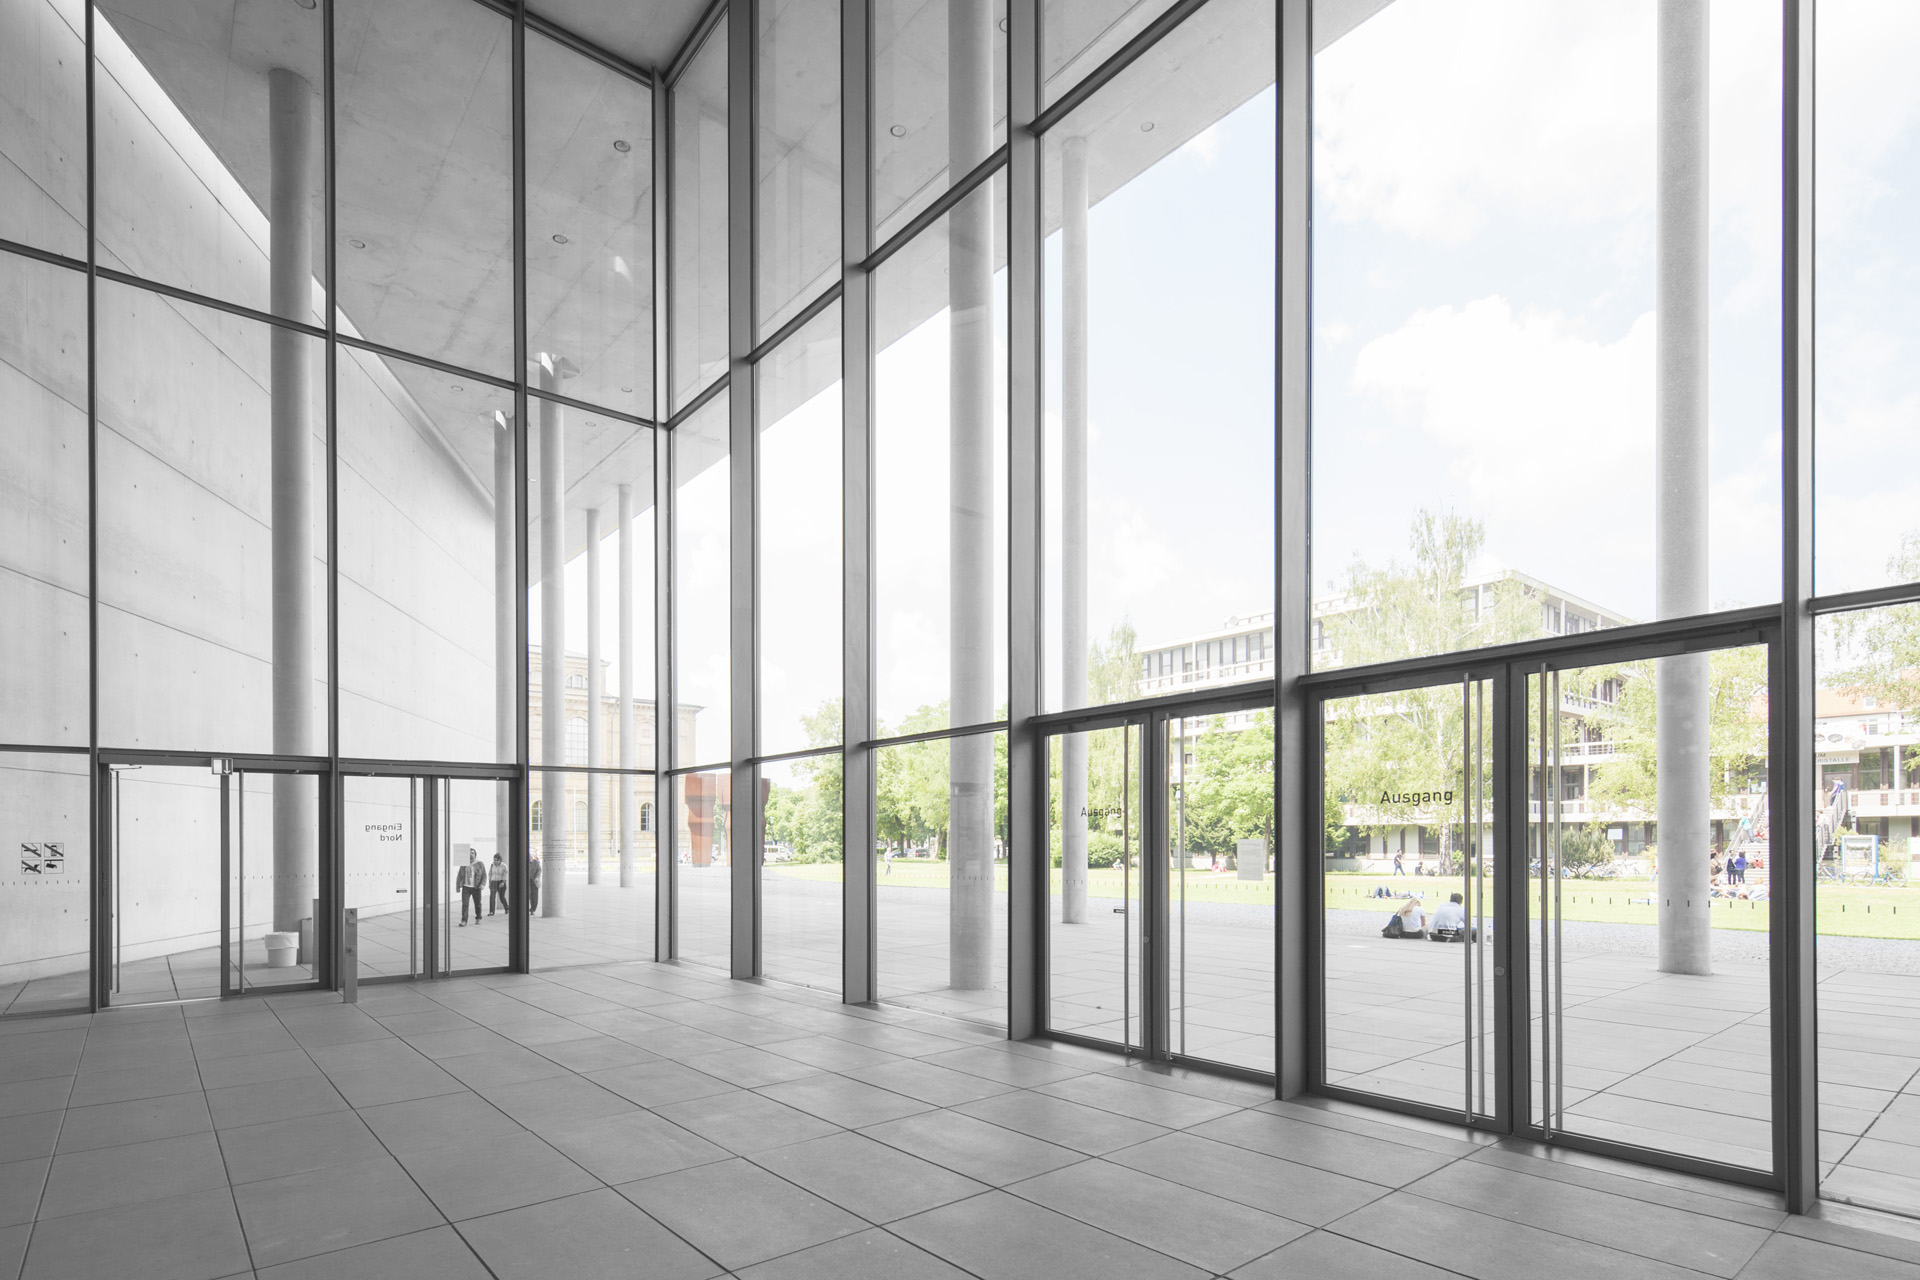 IMG 2666 - Pinakothek der Moderne